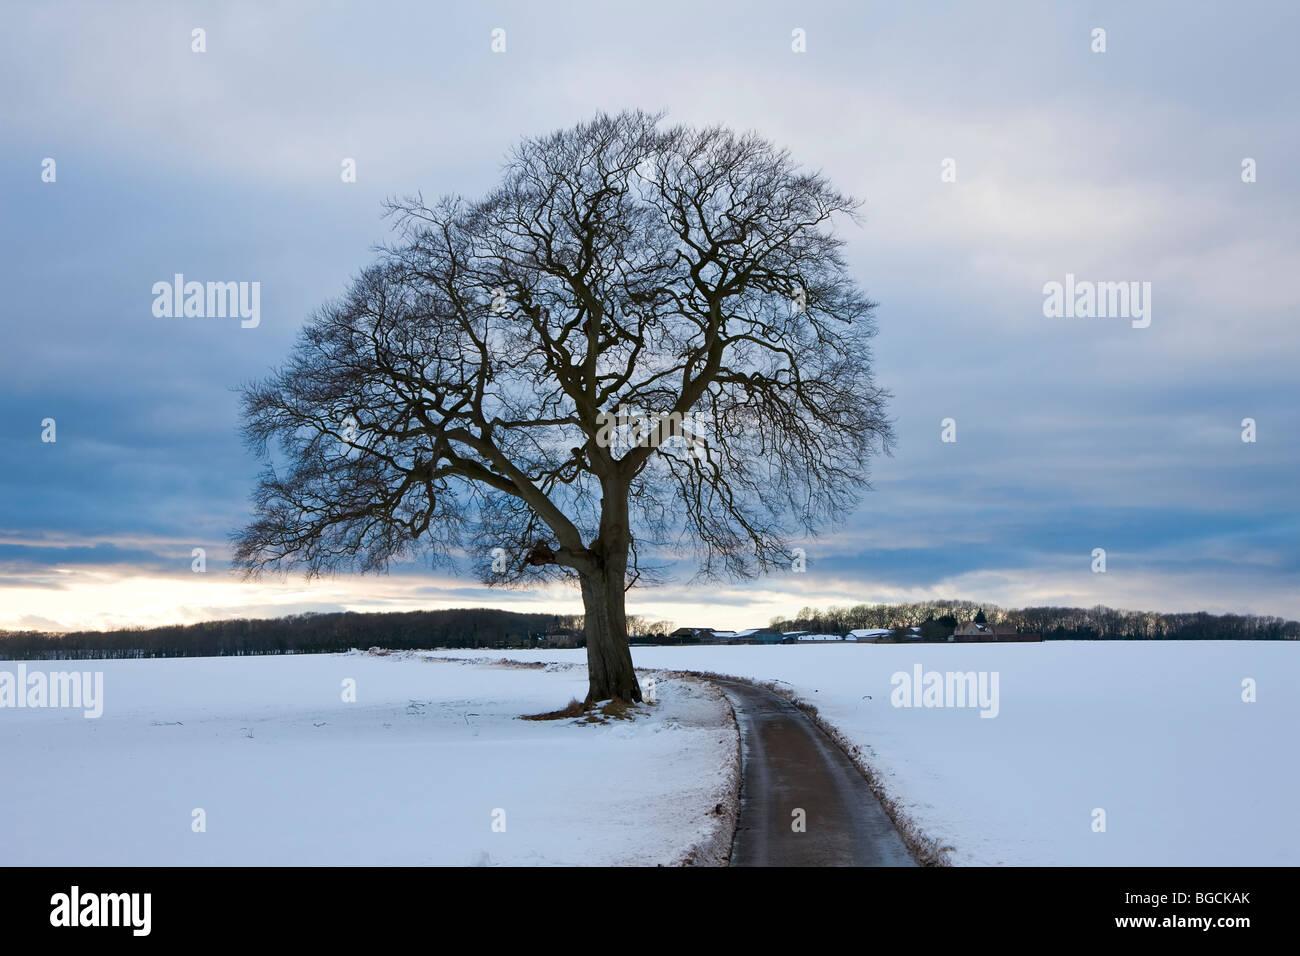 Árbol de Invierno & Country Lane, Gloucestershire, Reino Unido Imagen De Stock